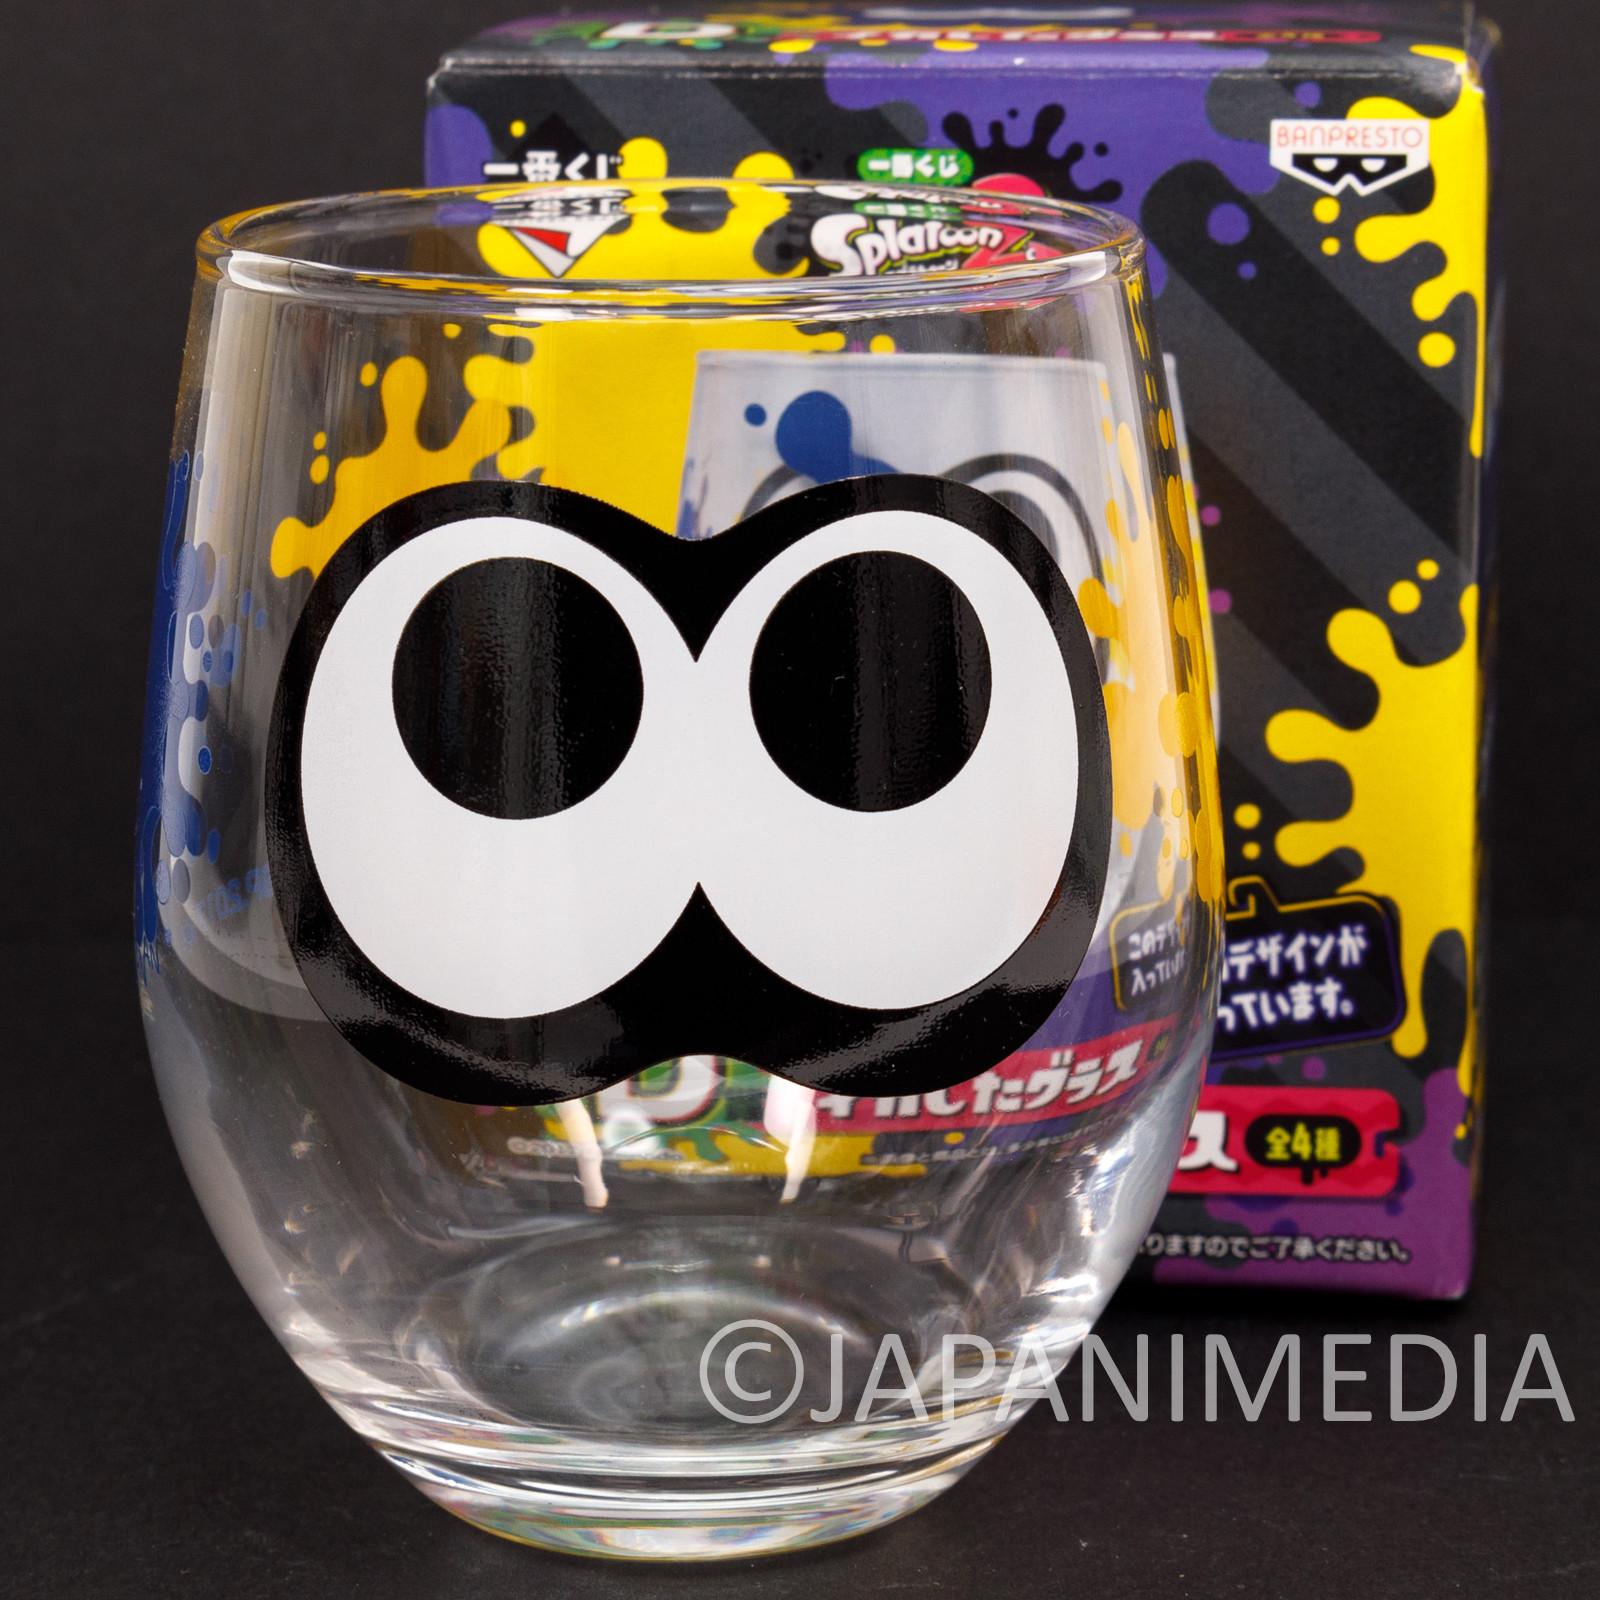 Splatoon Glass #3 Banpresto Nintendo JAPAN Nintendo Switch